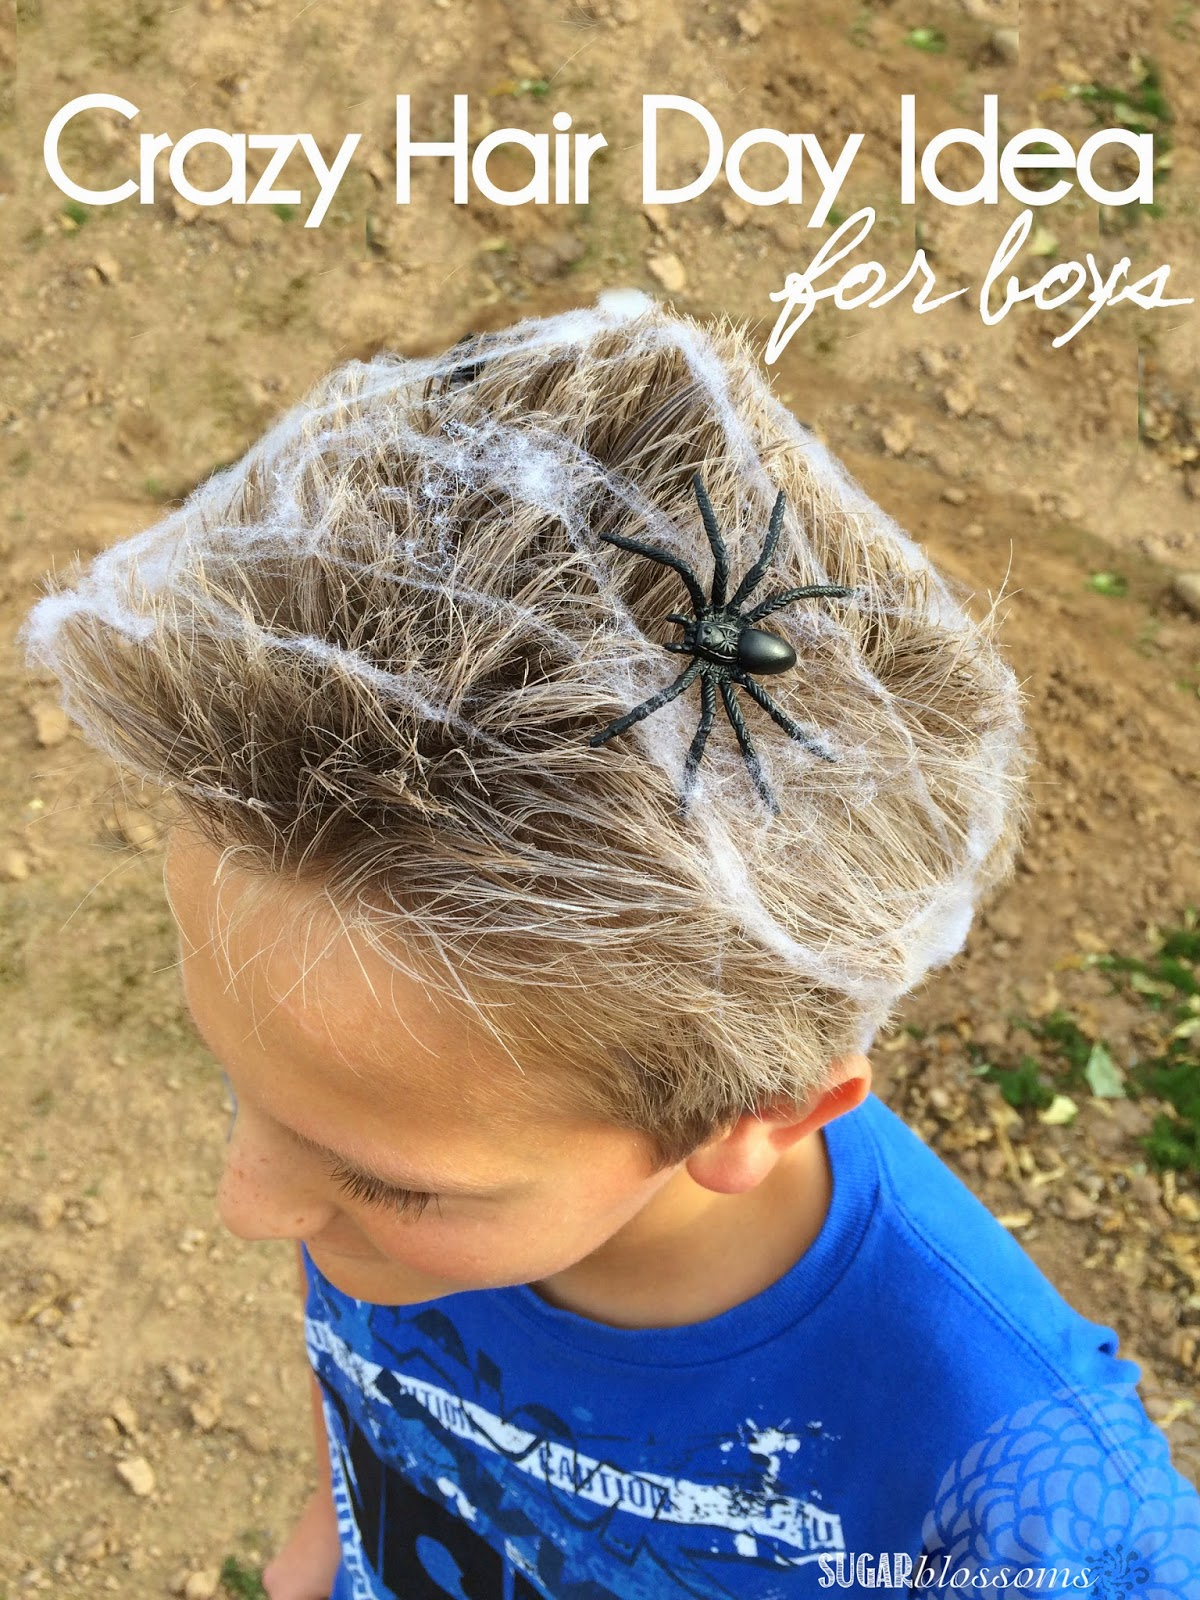 Sweet Sugar Blossoms Crazy Wacky Hair Day Idea For Boys